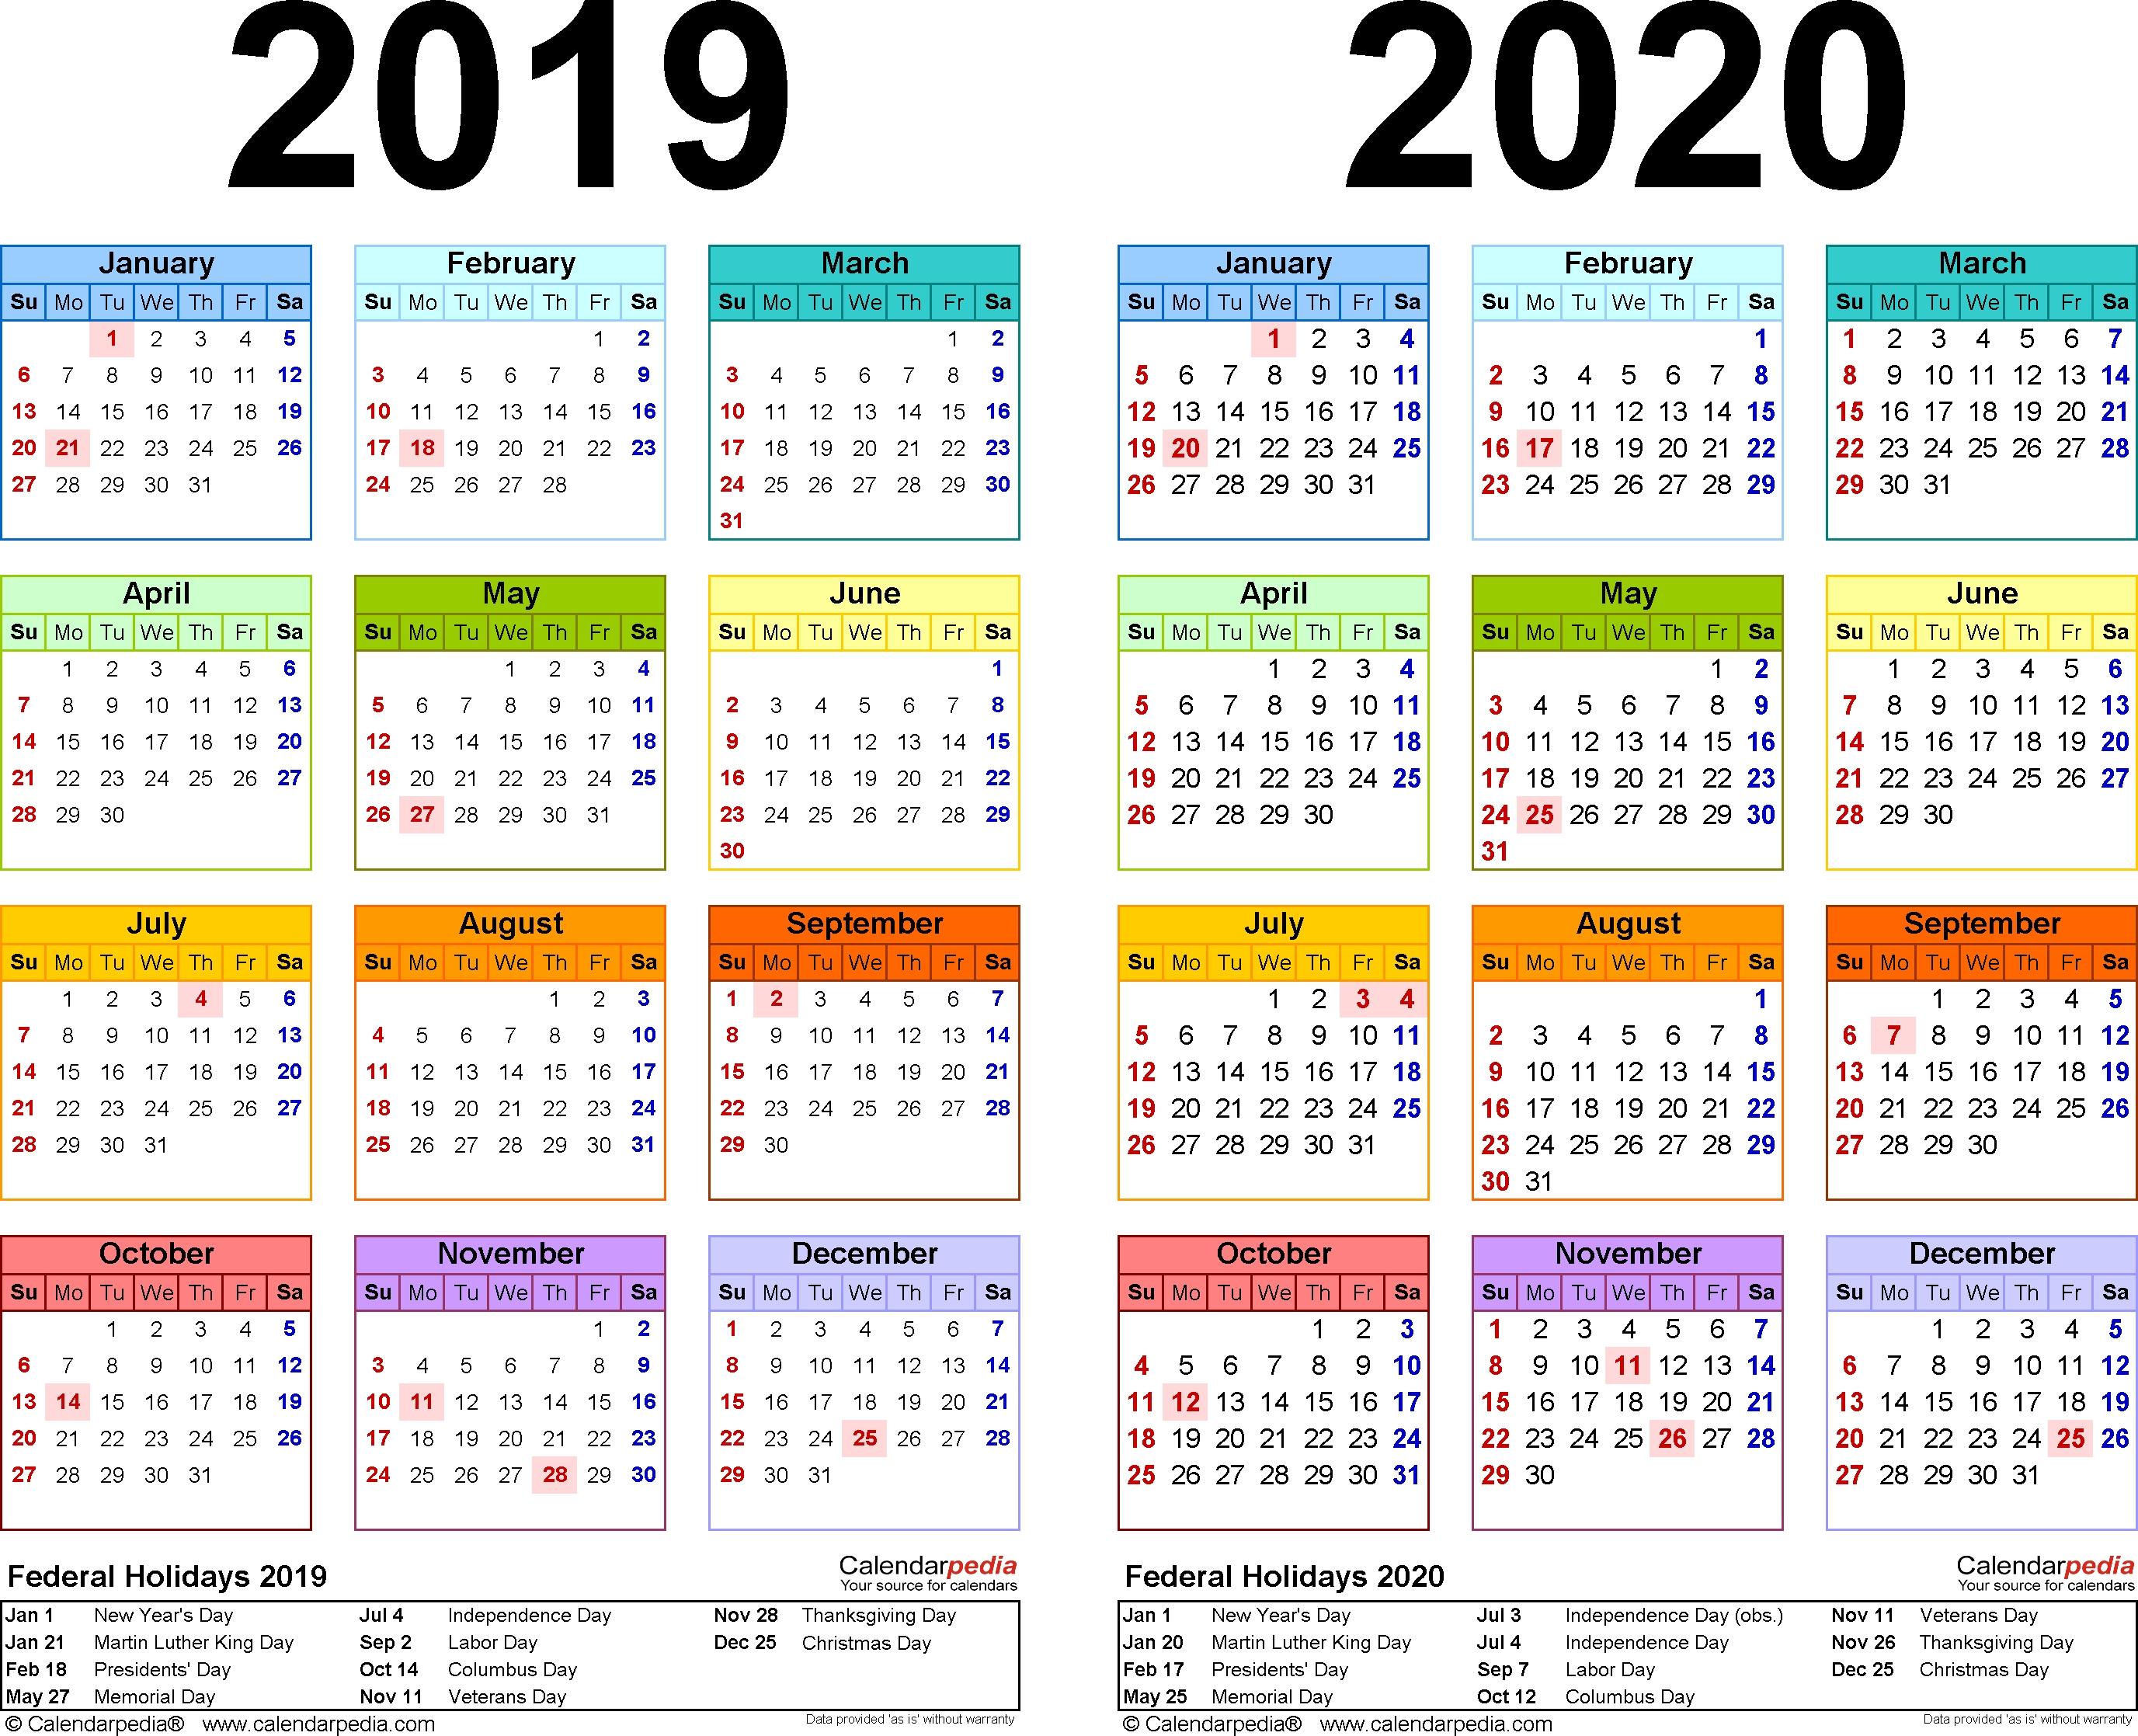 November 2020 Calendar Australia 2 - Wpa.wpart.co